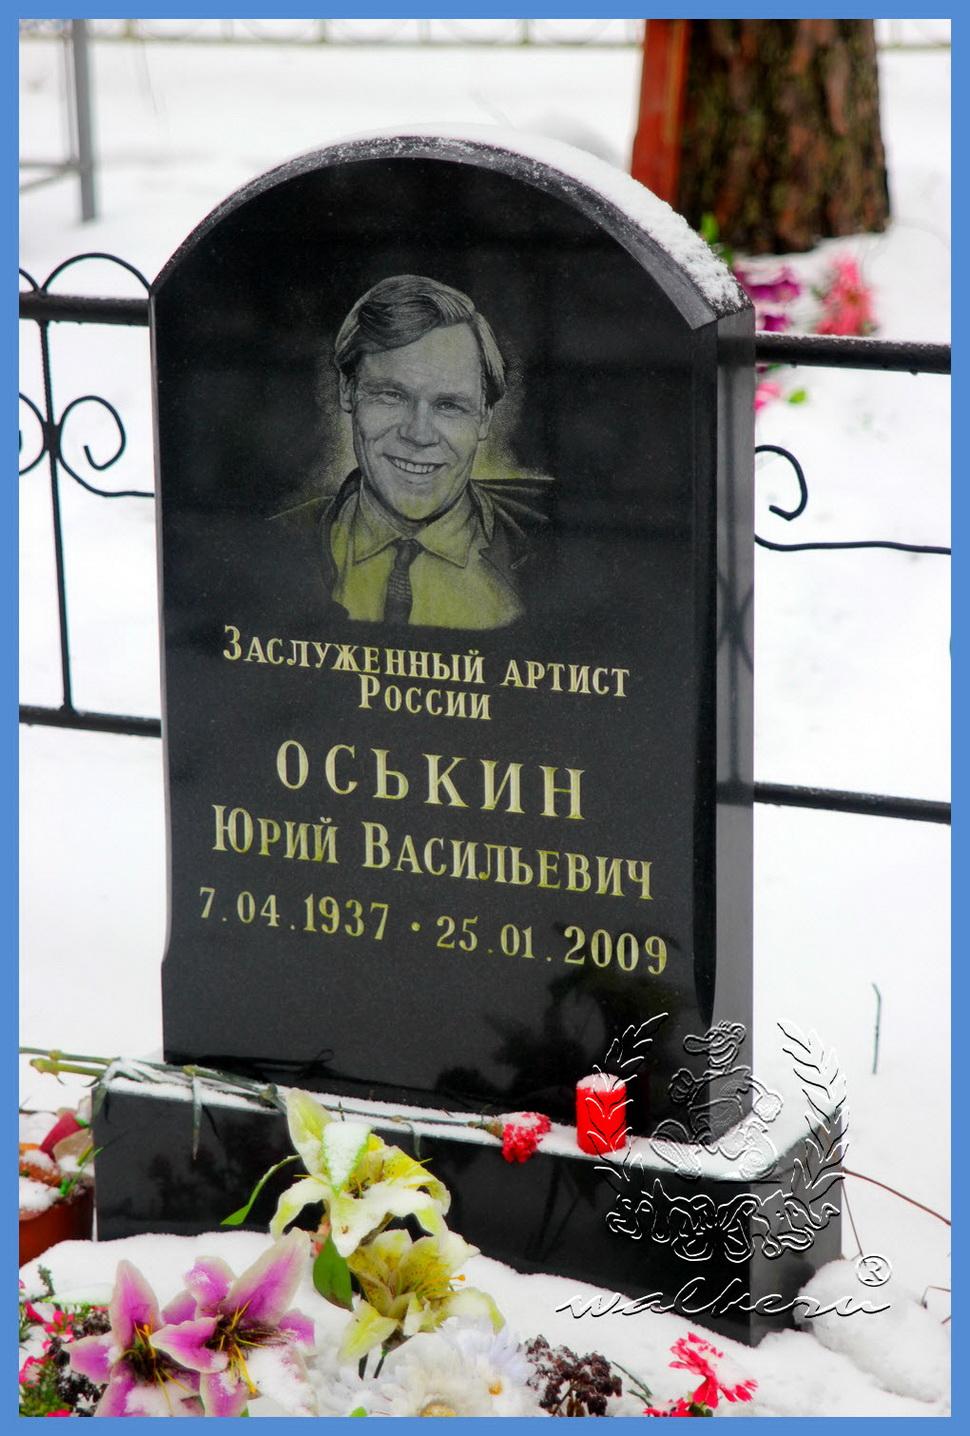 Оськин Юрий Васильевич